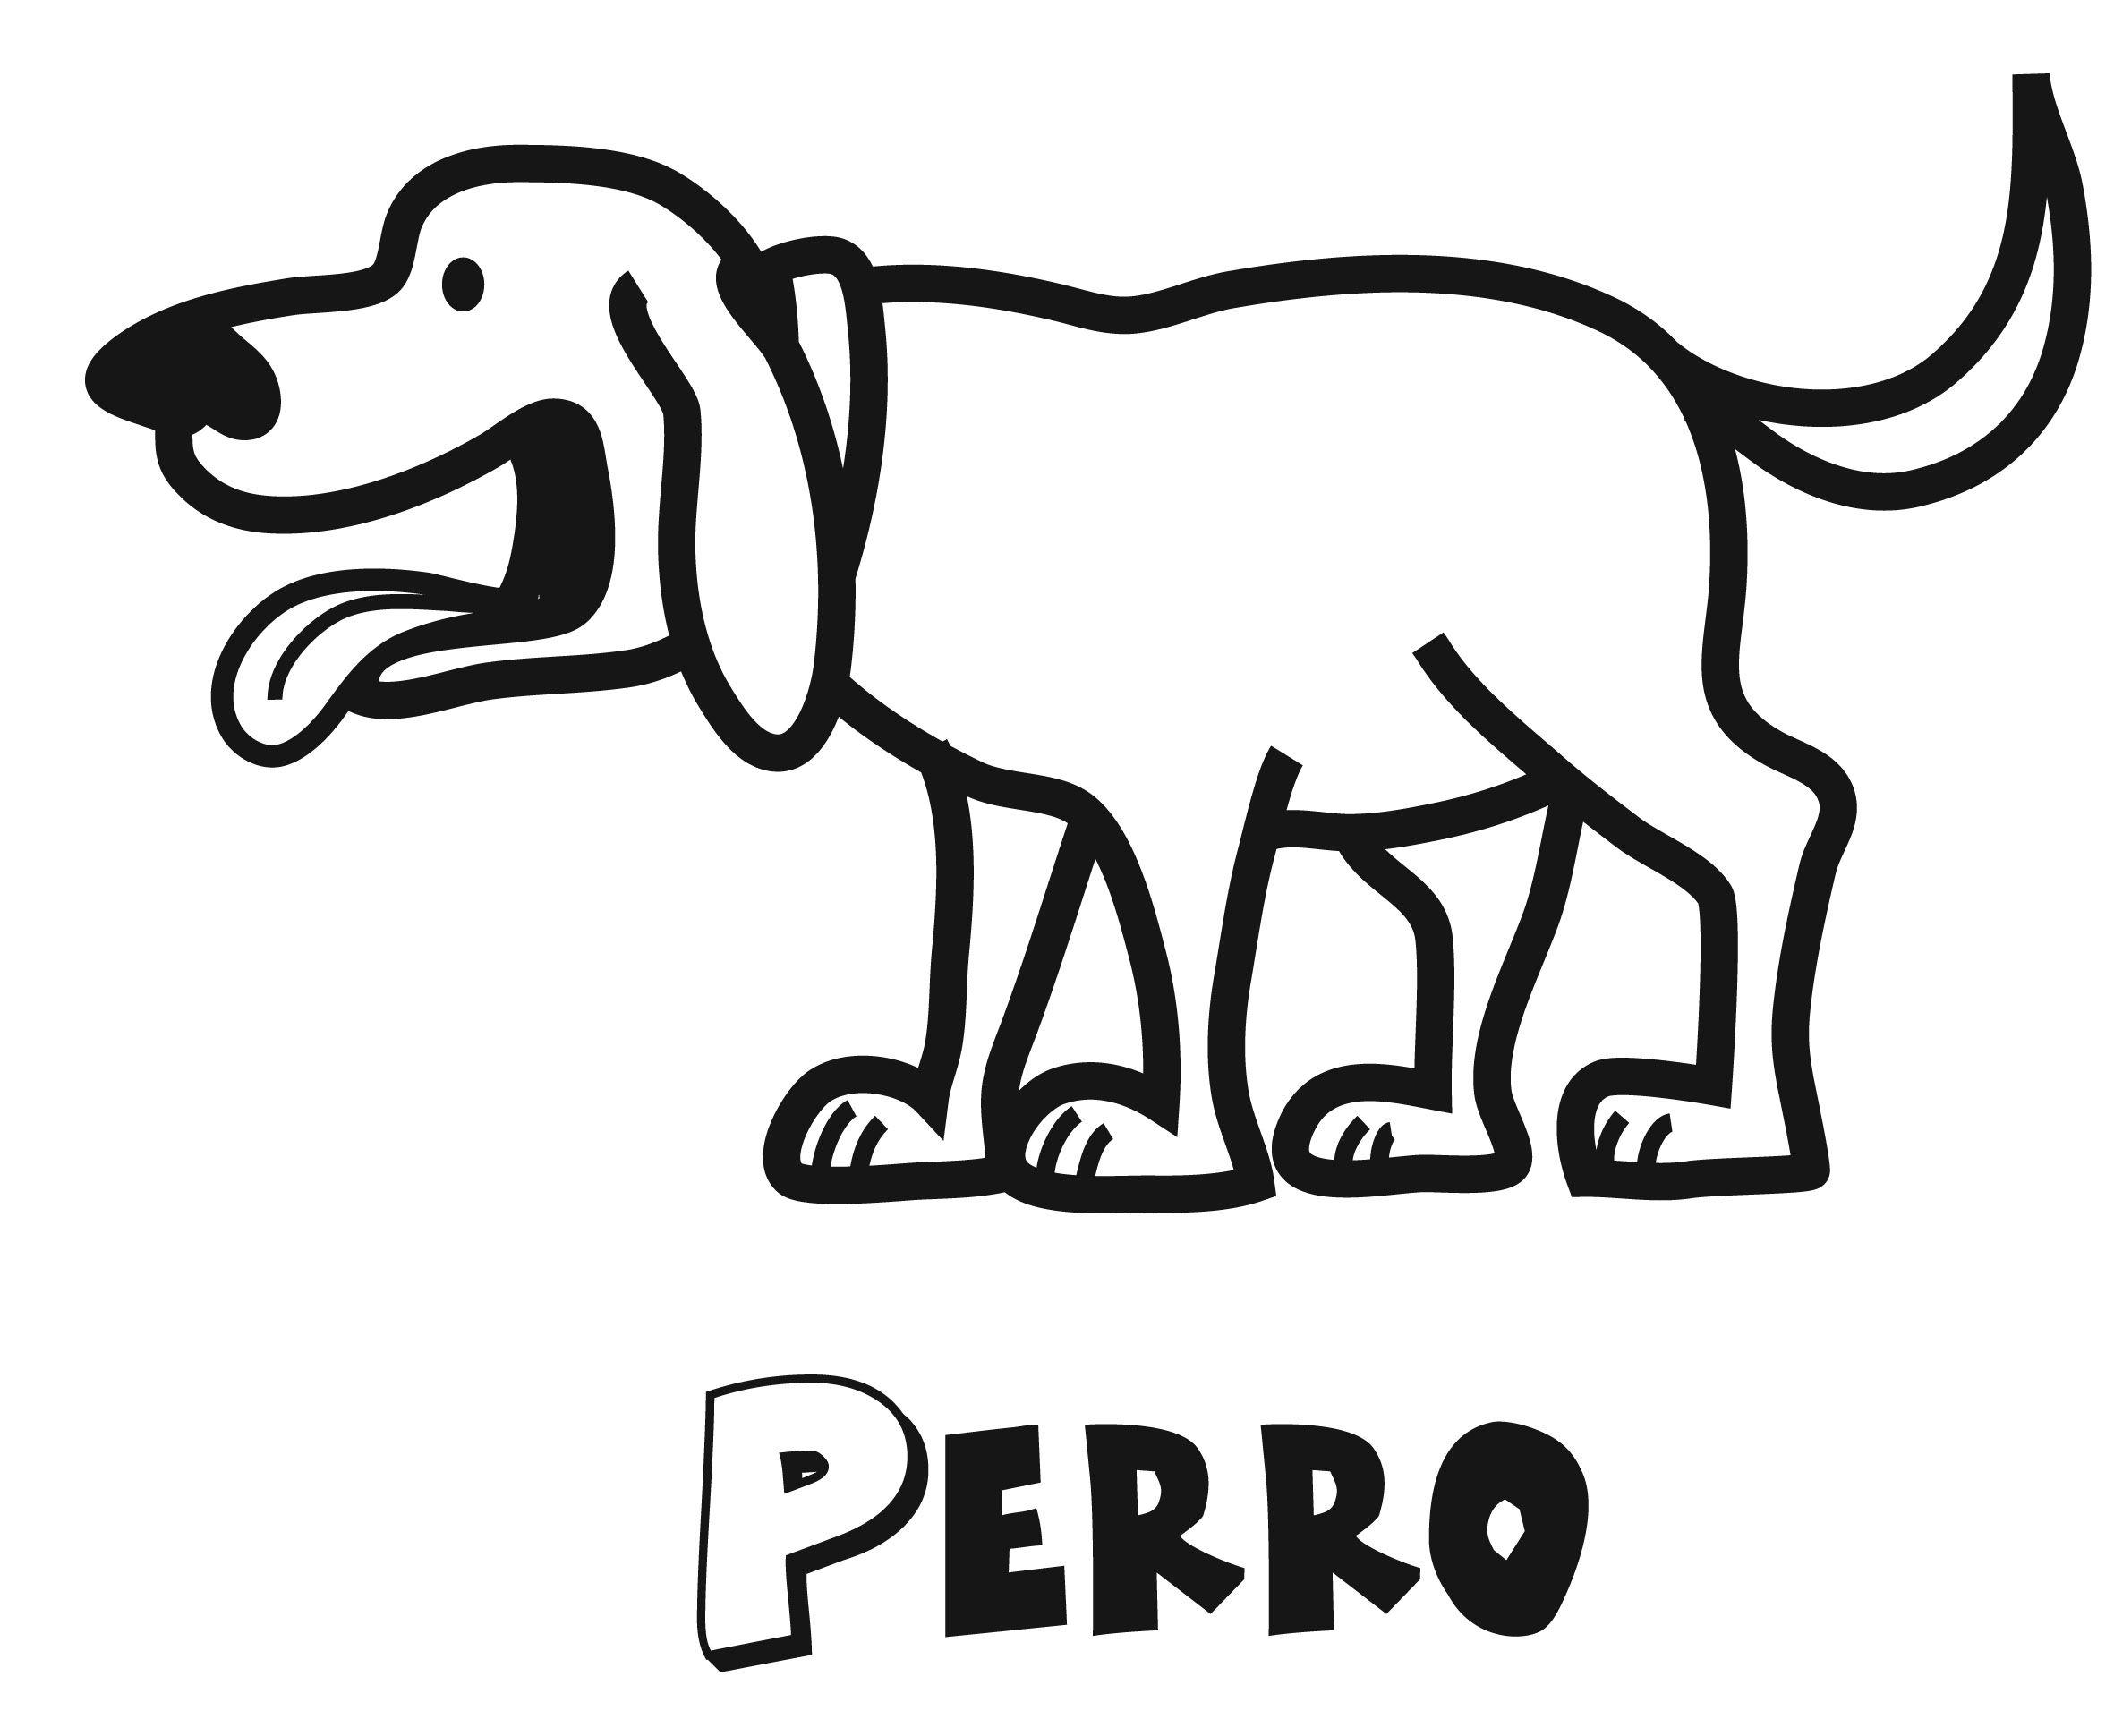 Encantador Perro Para Colorear Para Colorear Composición - Ideas ...